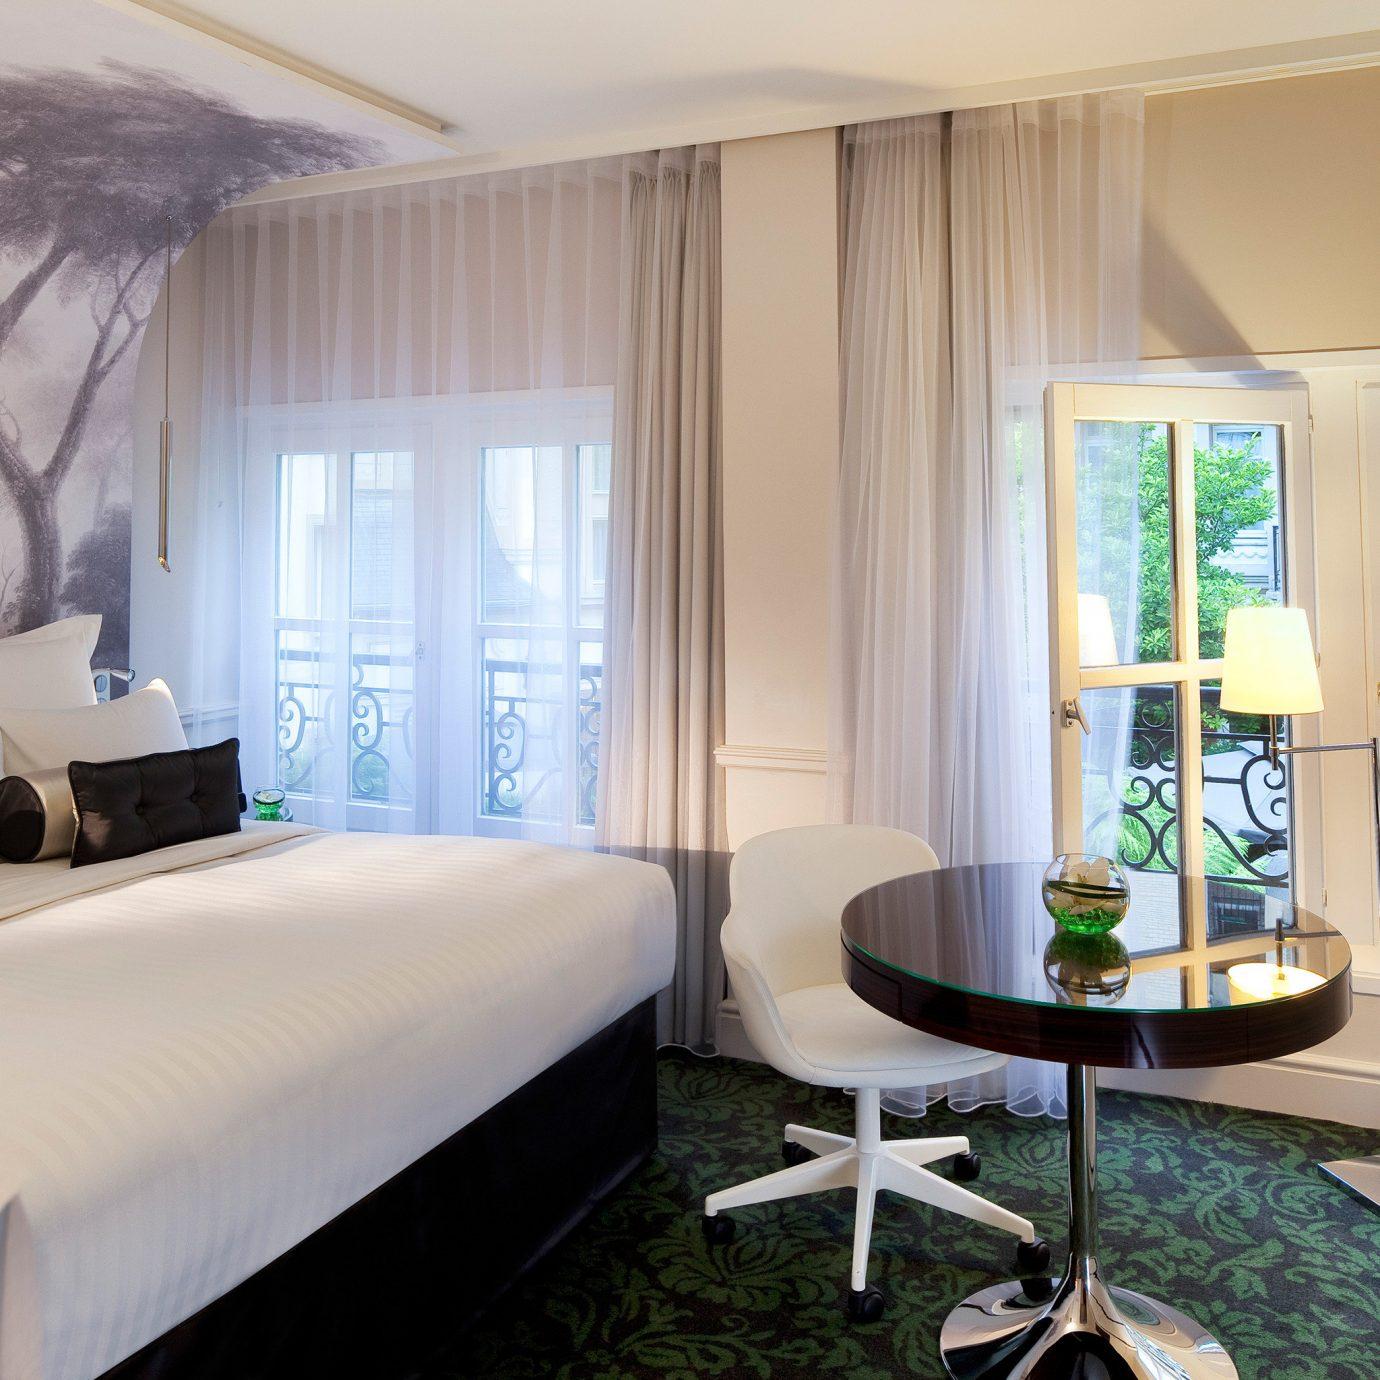 Bedroom Suite property house condominium home living room Villa cottage